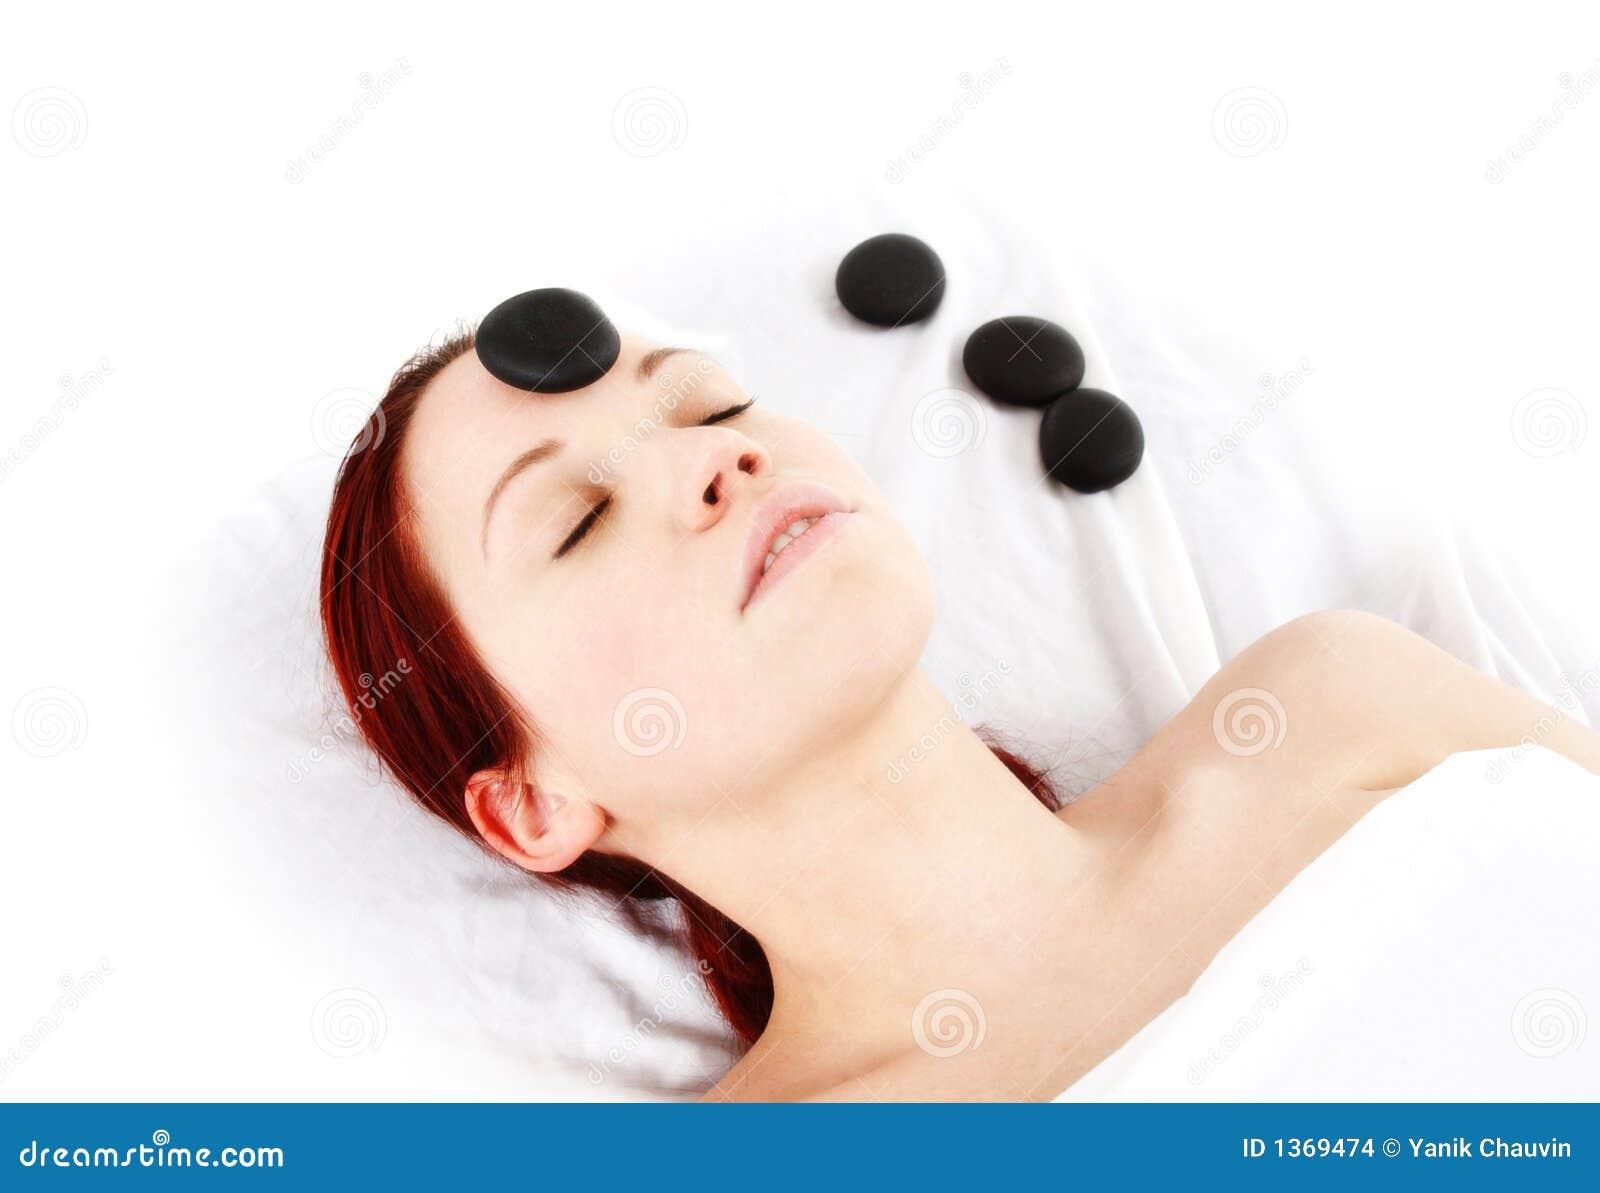 массаж hotstone